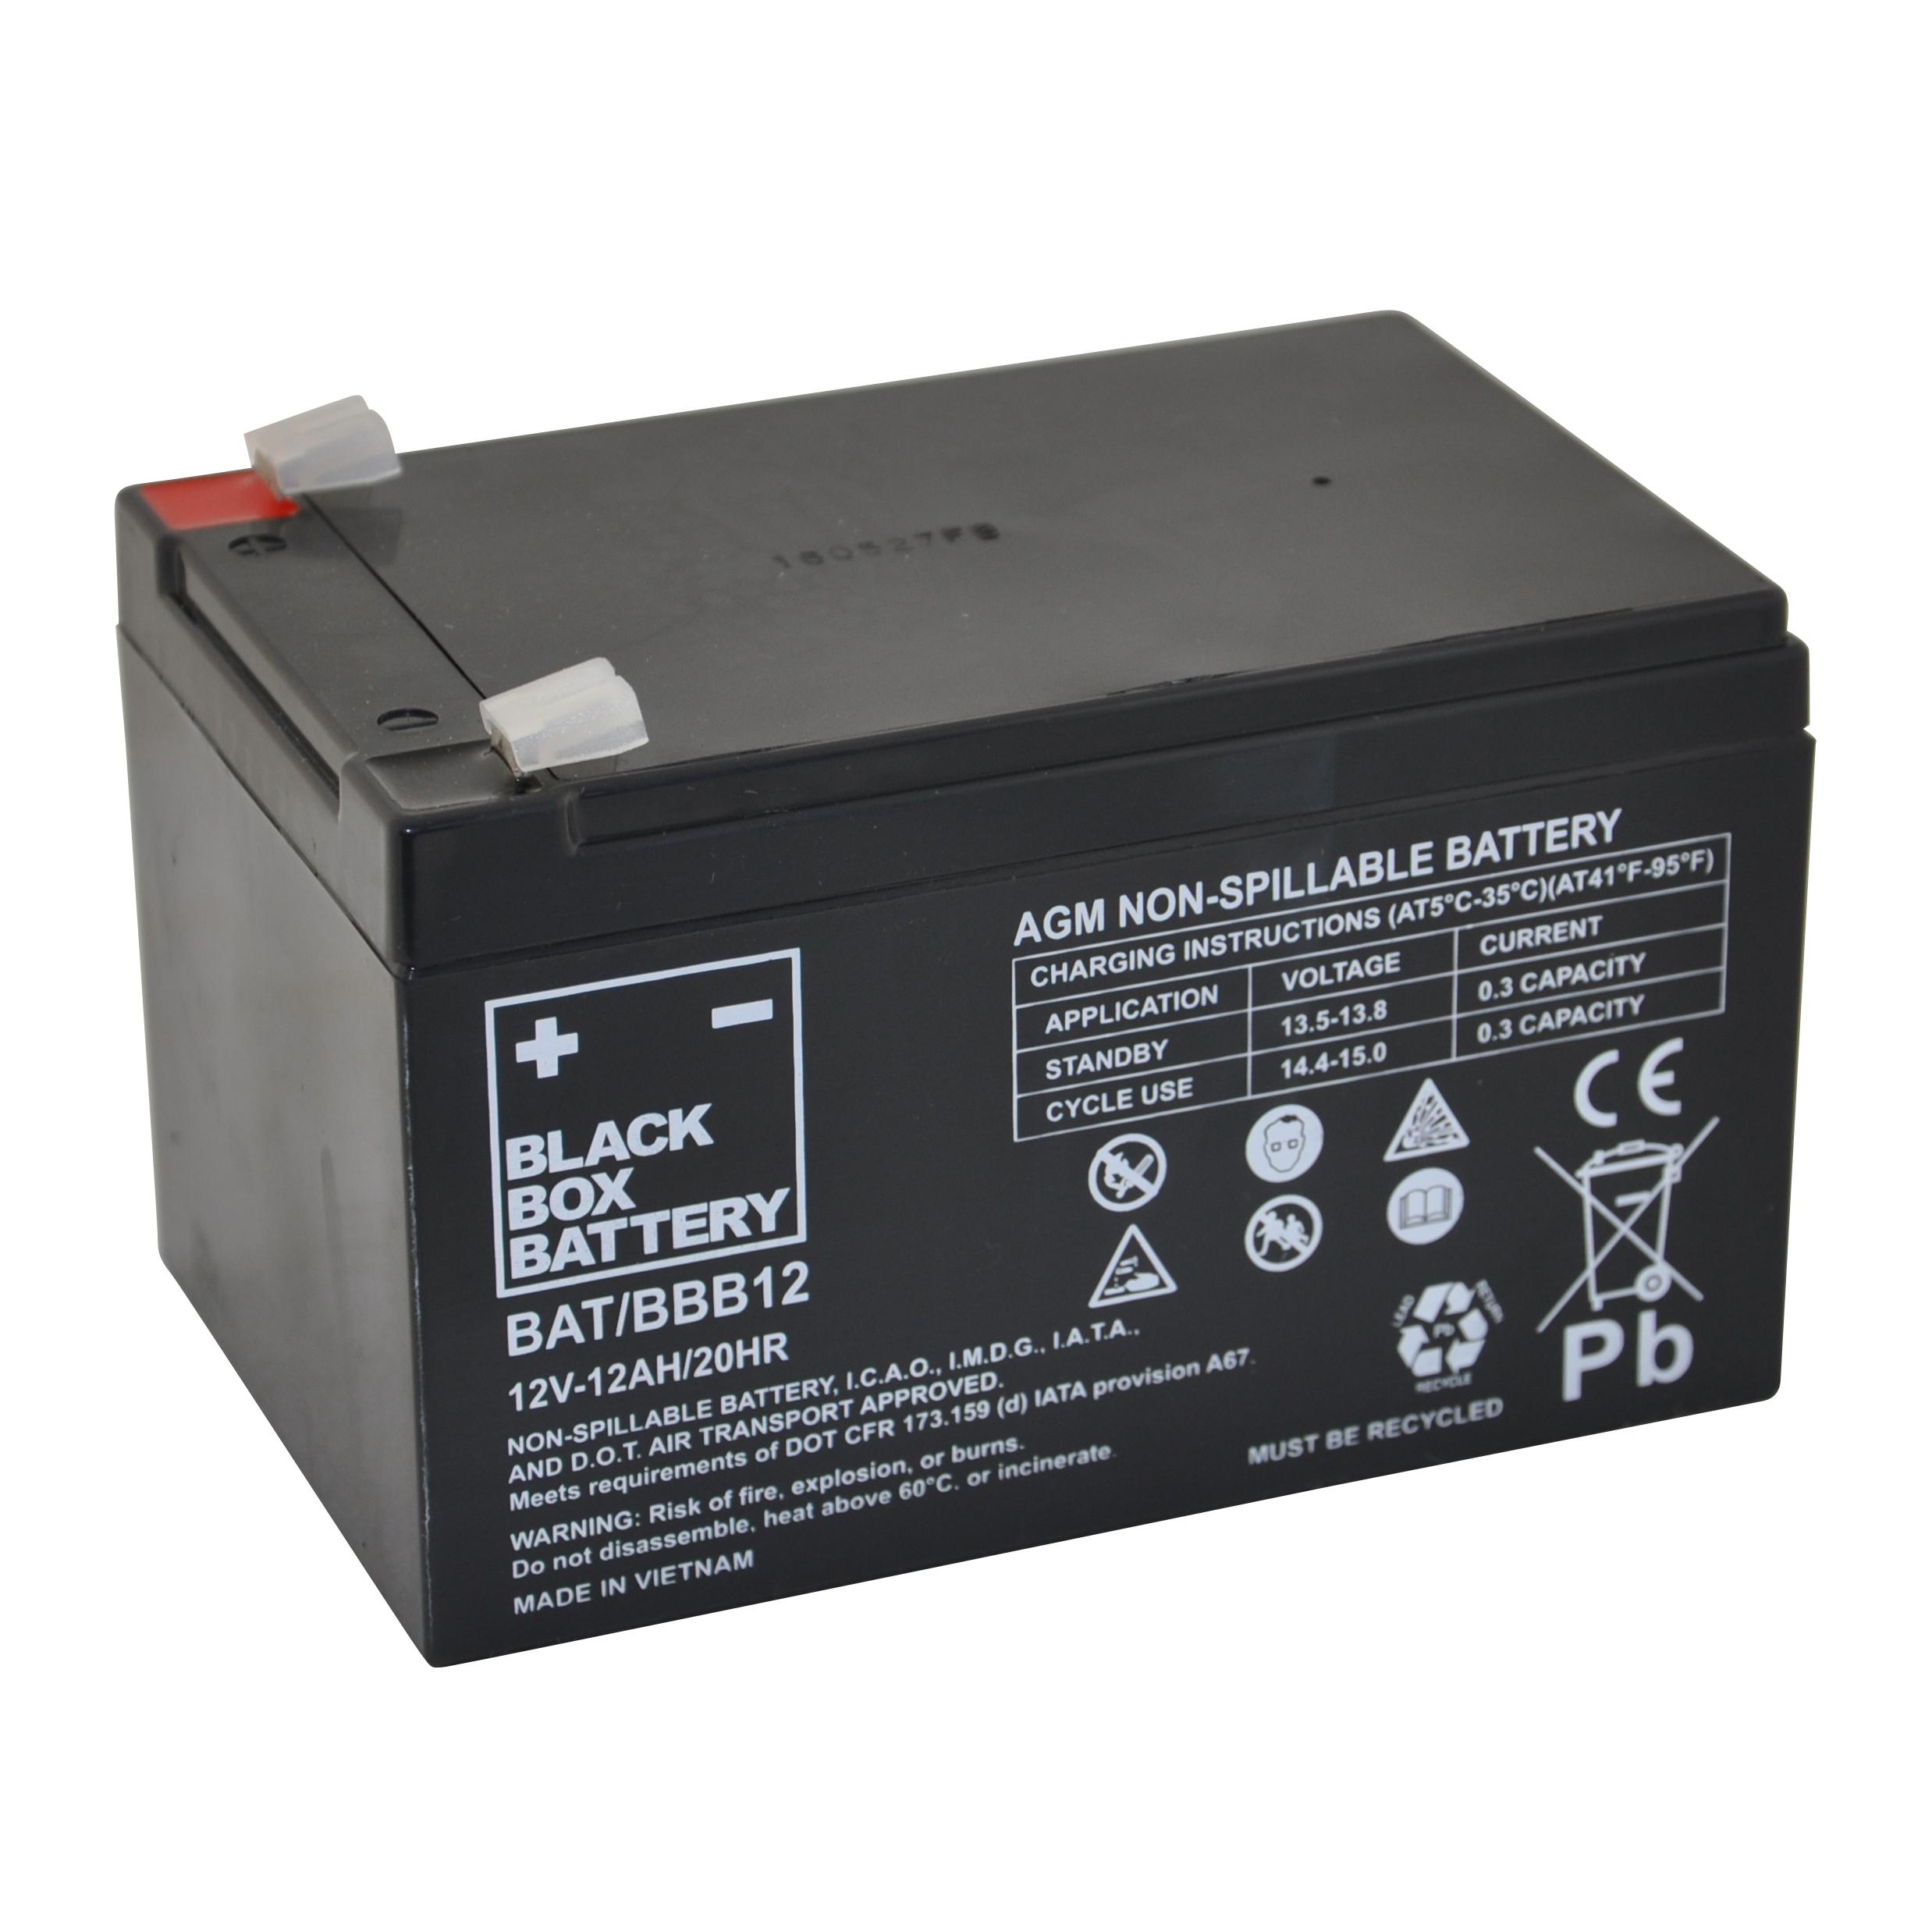 12ah Black Box Agm Battery Flexel Mobility